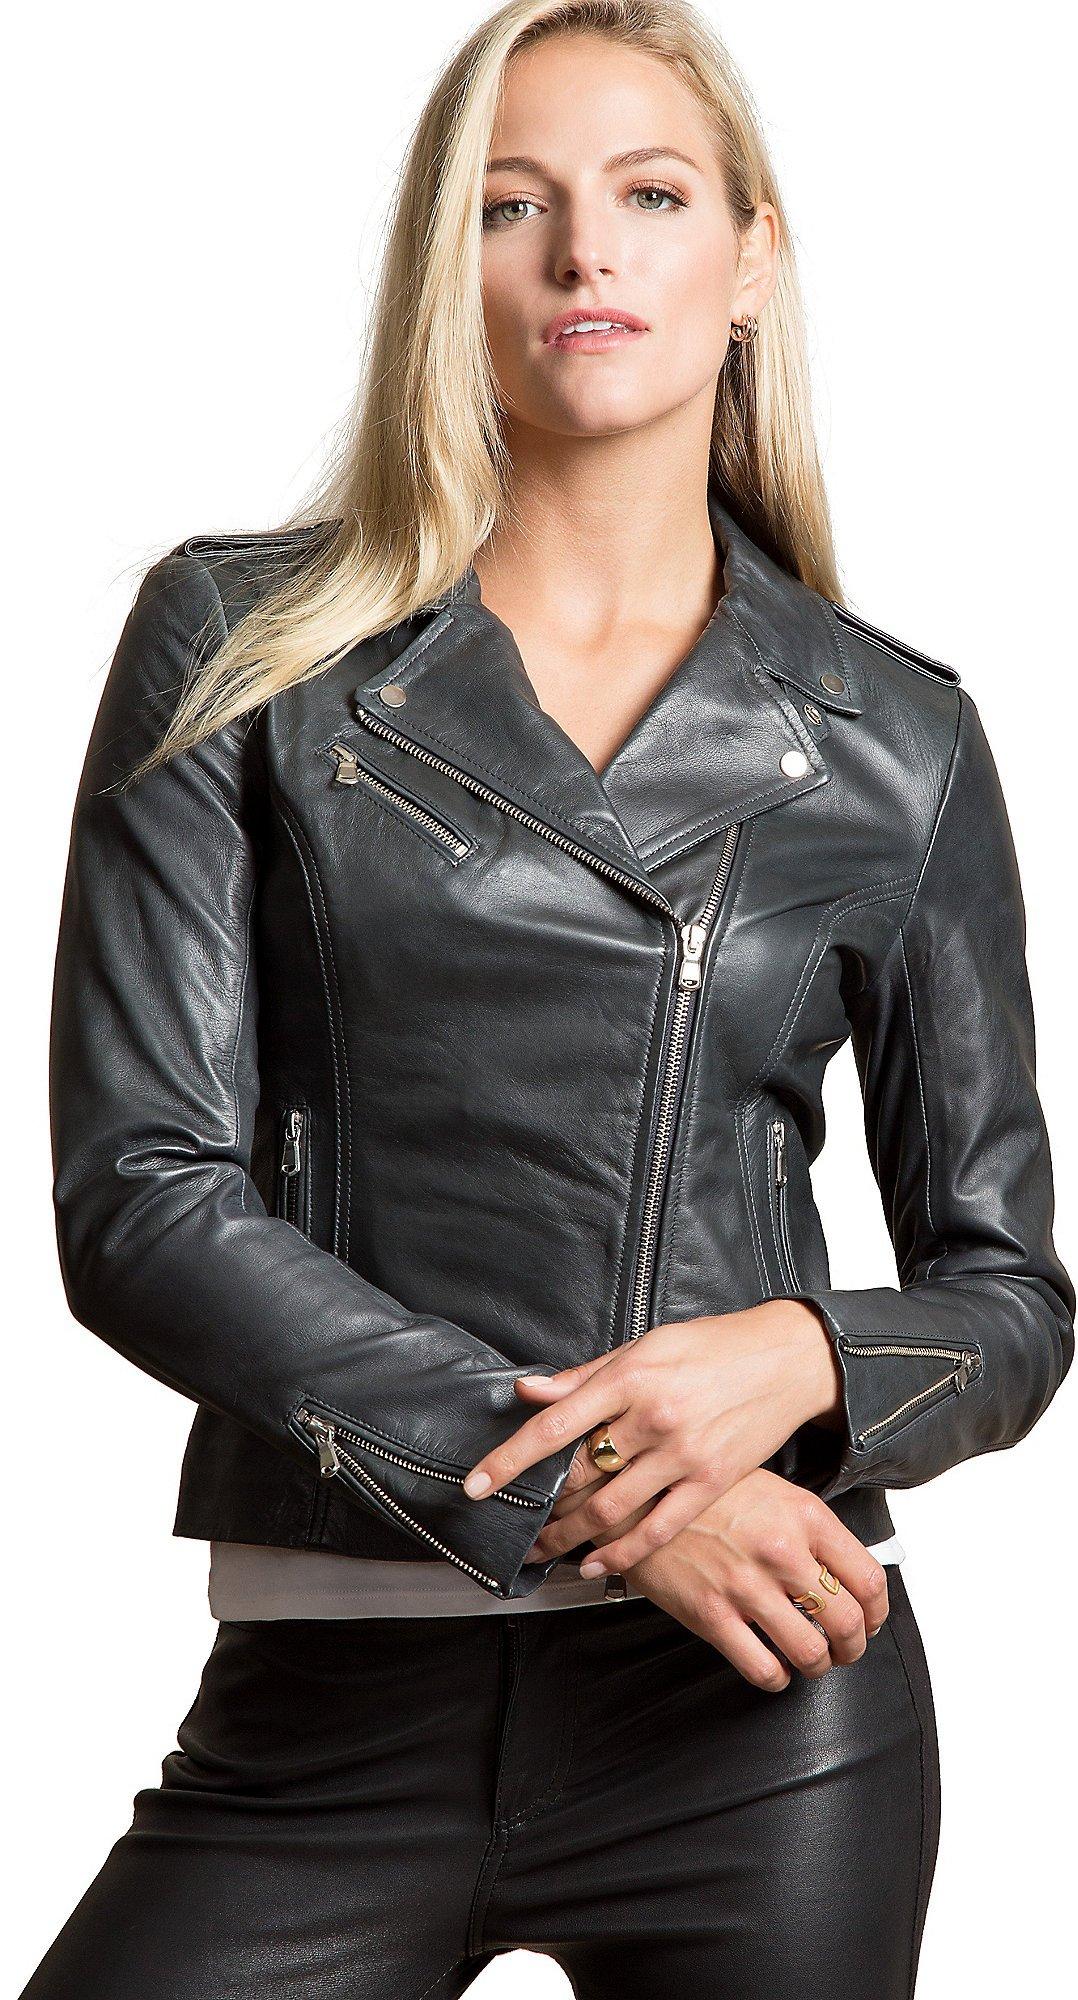 Harper Lambskin Leather Moto Jacket, Compact Grey, Size Large (14)